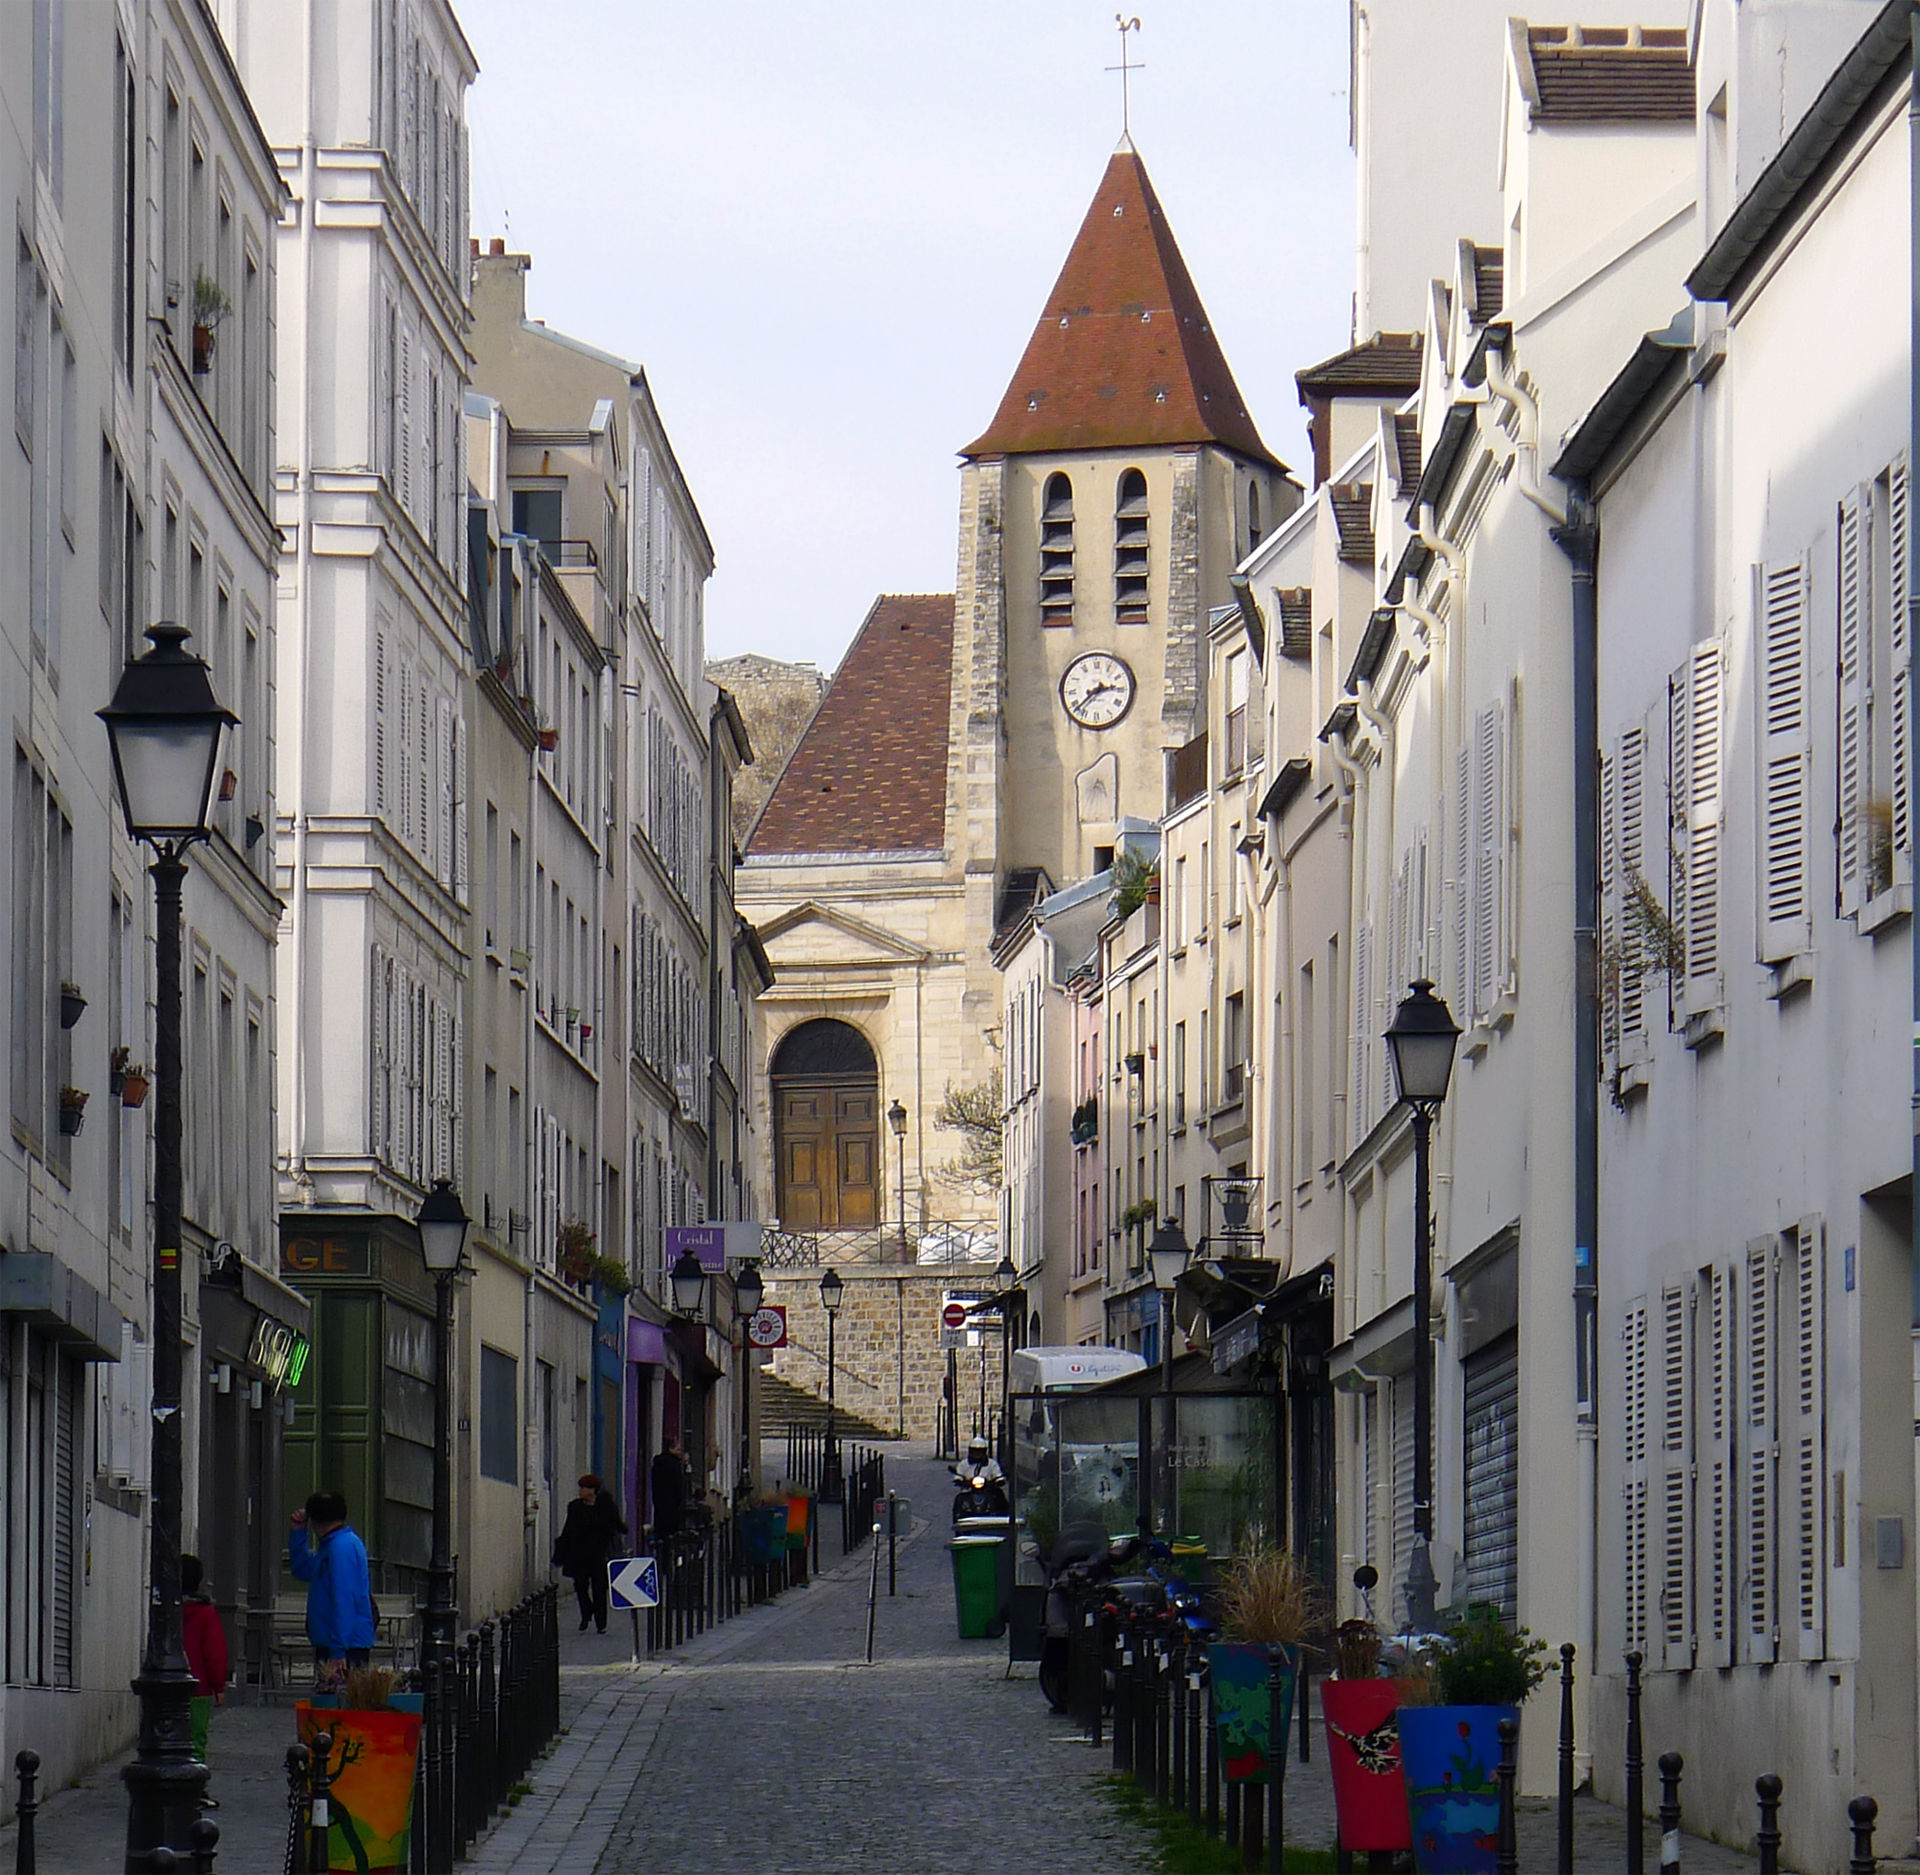 Rue saint blaise wikip dia for Carrelage du sud boulevard saint germain